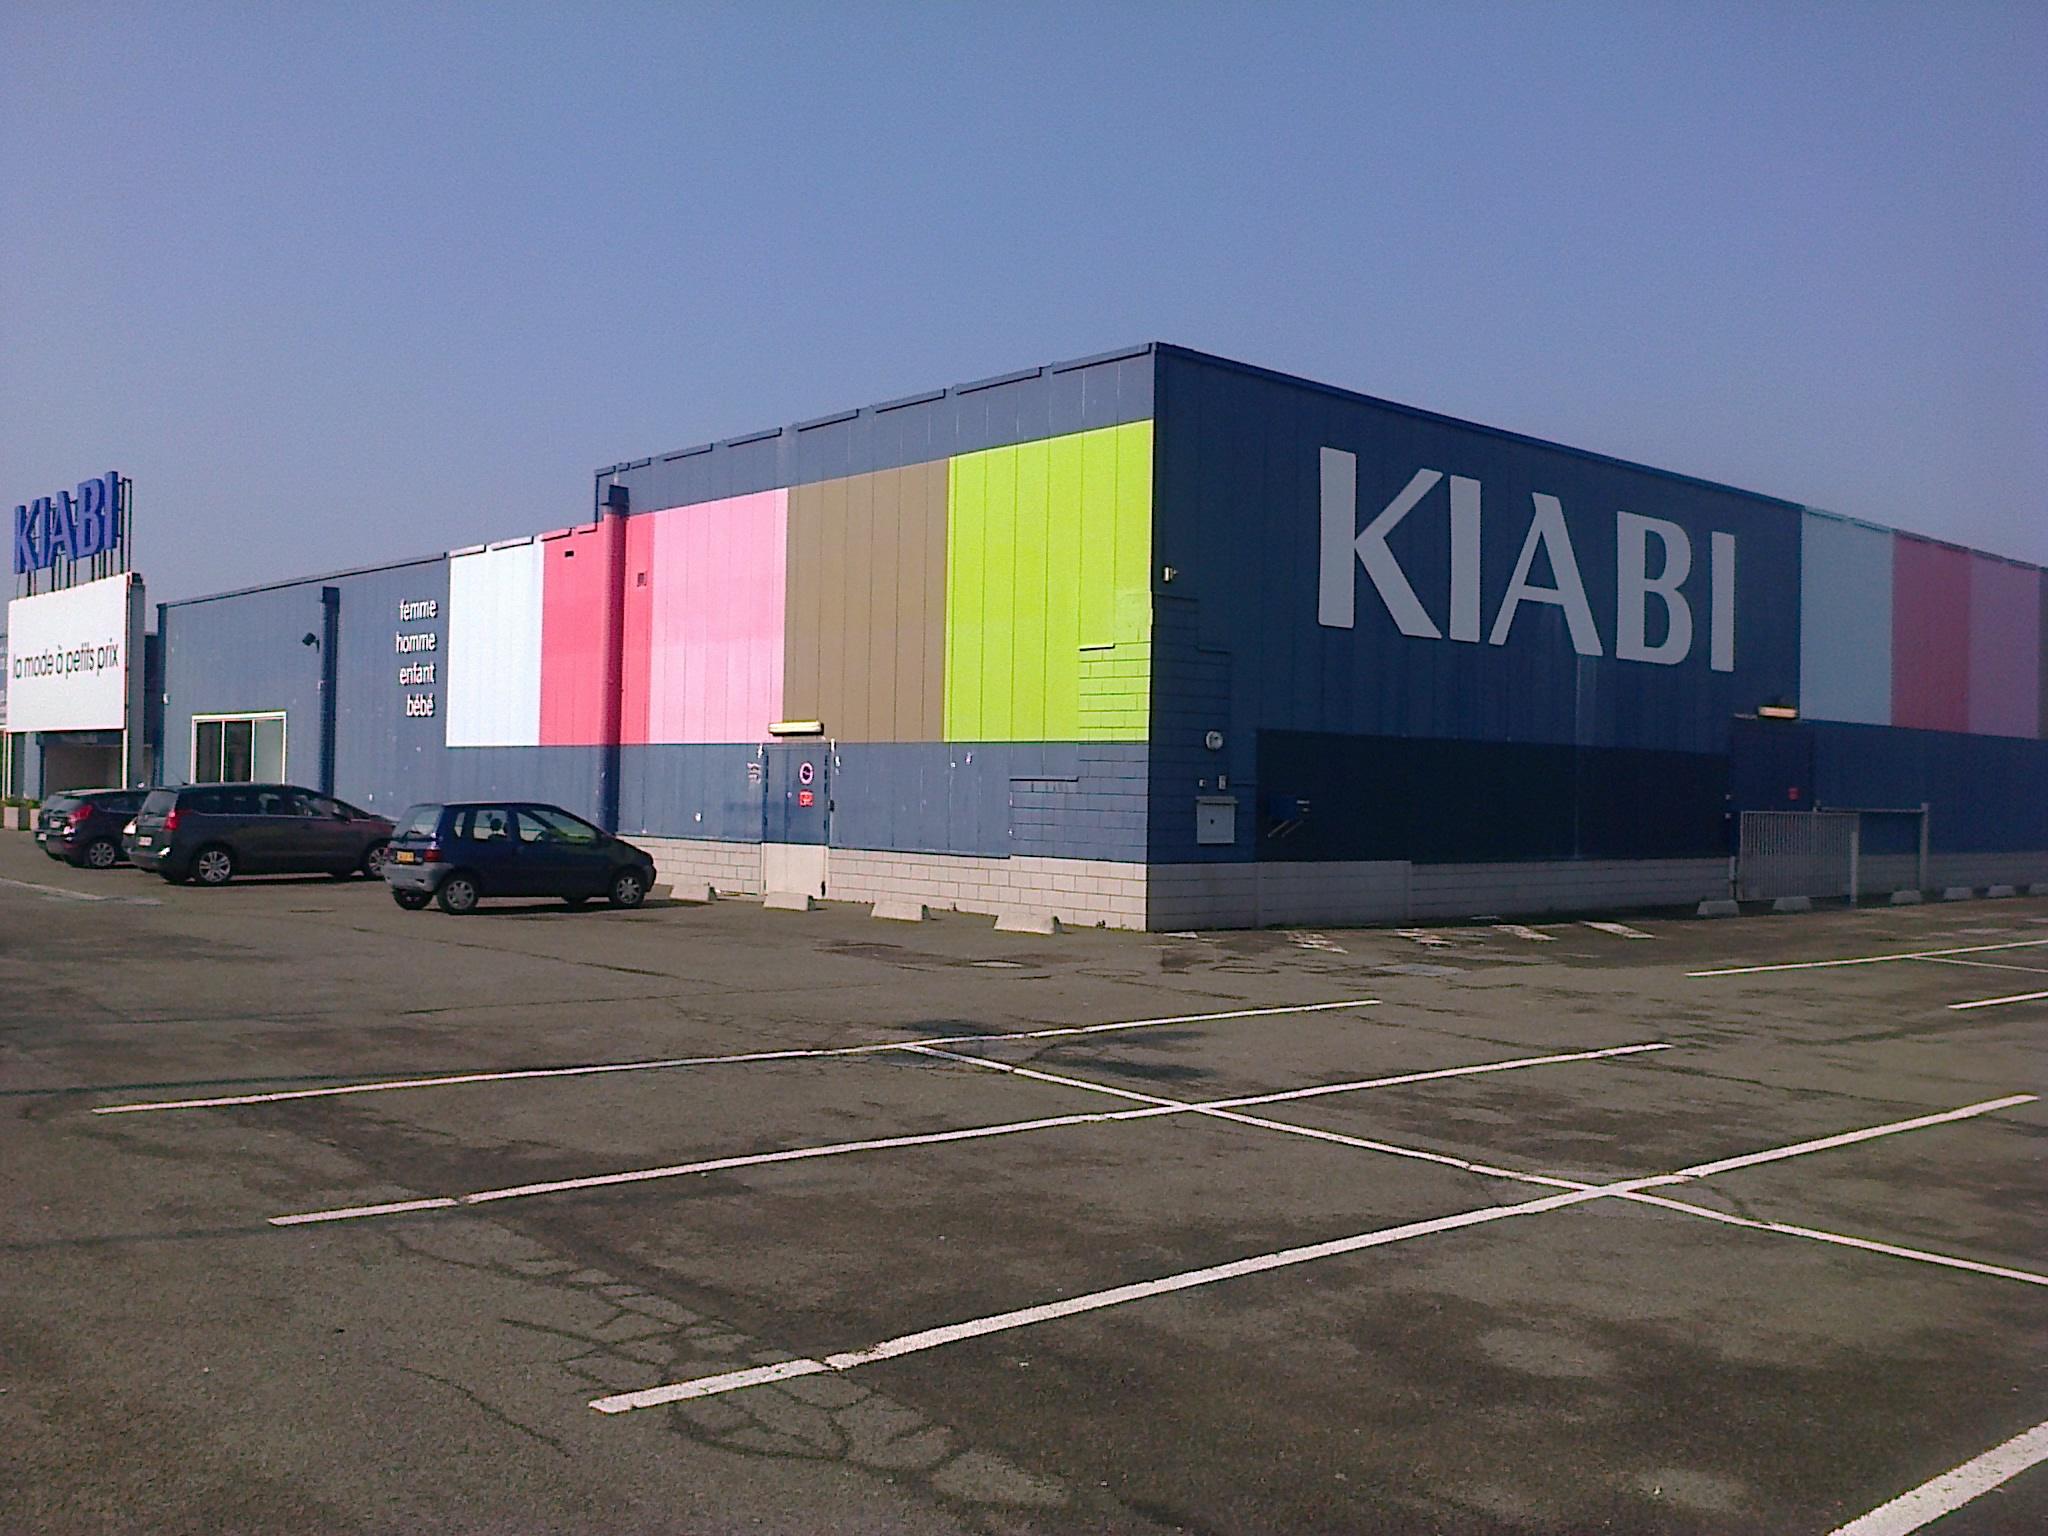 Kiabi Wikipedia